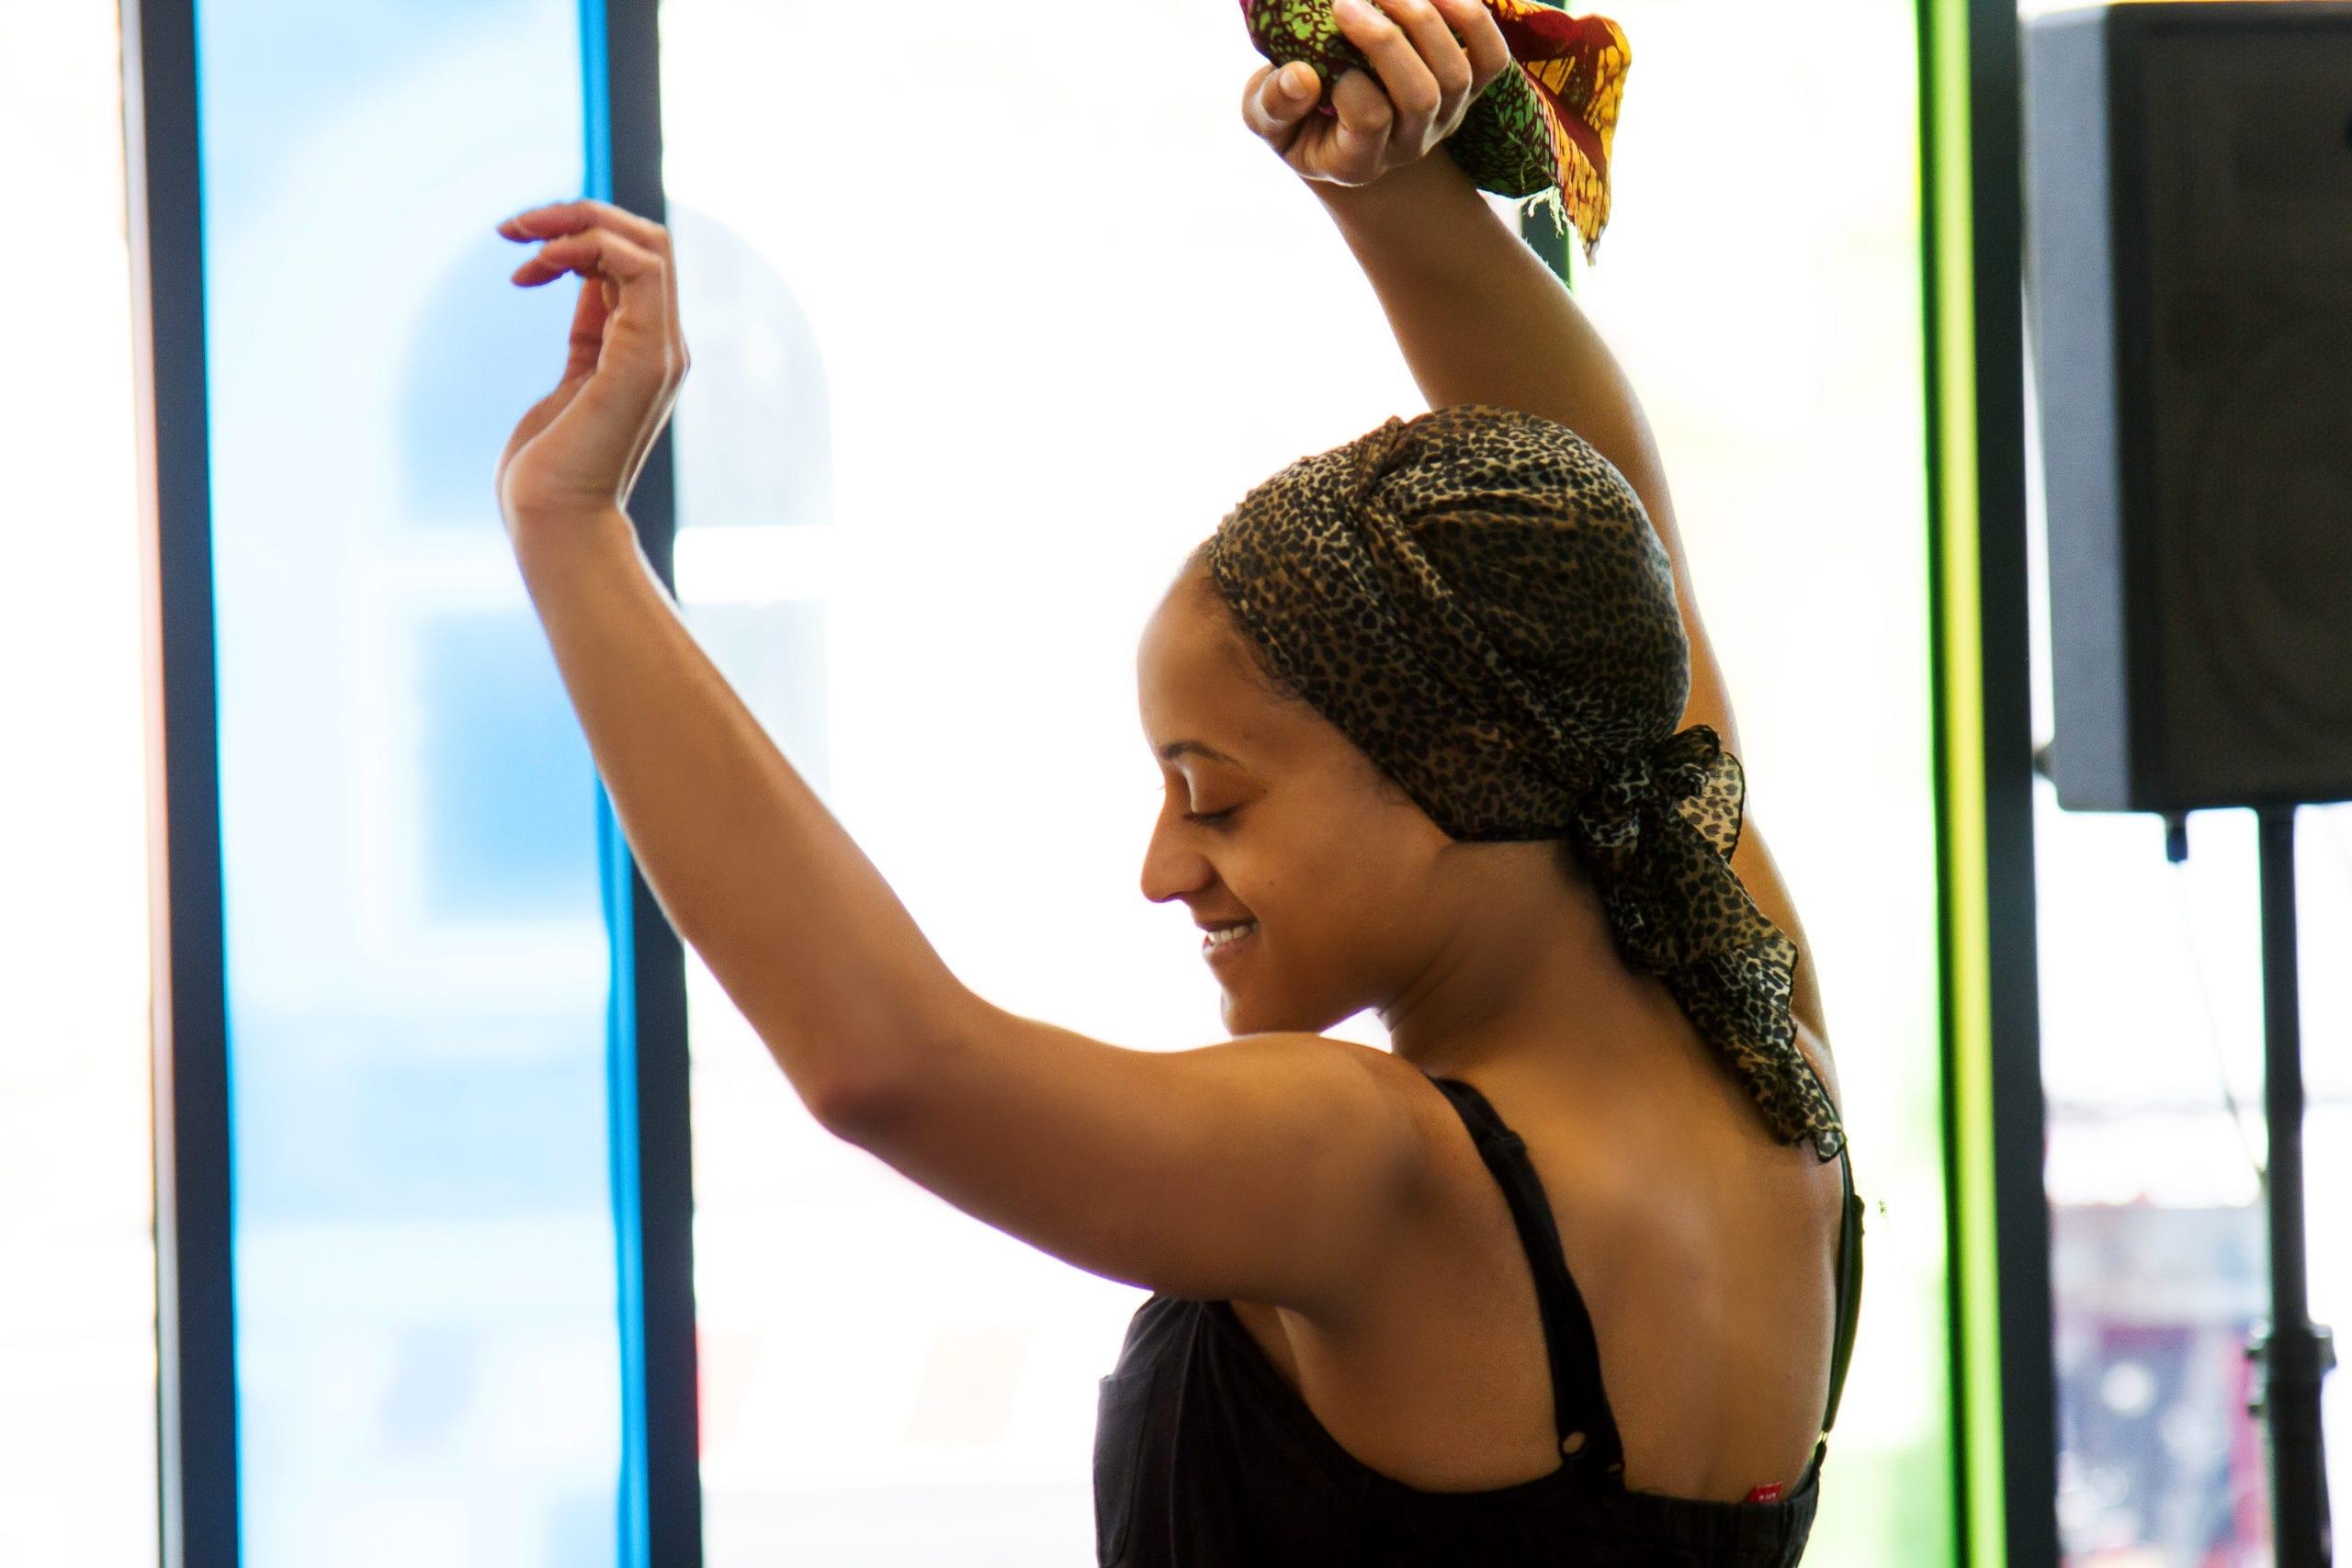 A woman dancing at a Lyrici Arts event